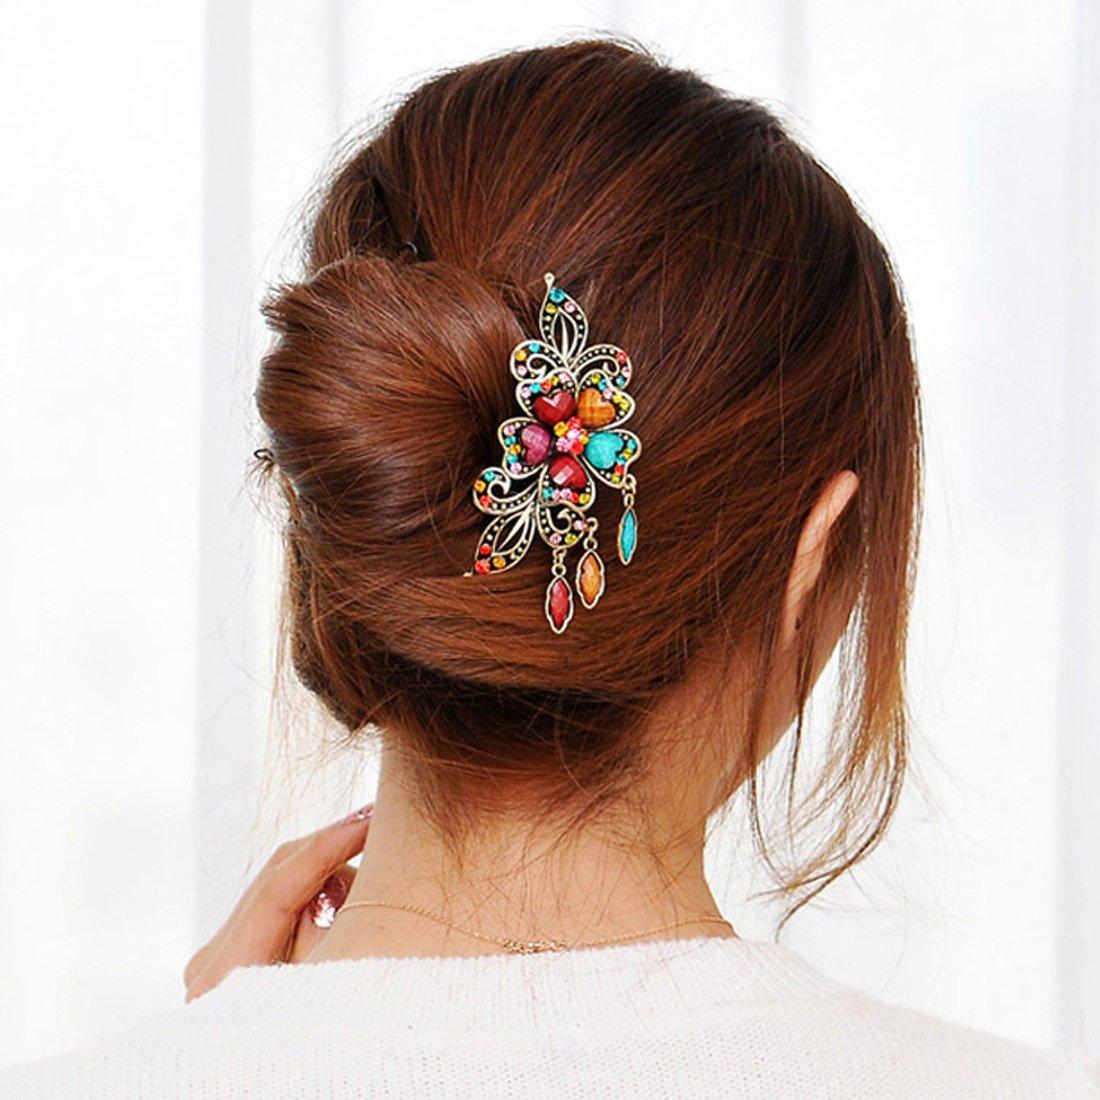 Voberry® Retro Vintage Fashion Antique Bronze Women's Colorfull Rhinestone Elegant Peacock Tuck Comb Hair Clip-colorful with Accessory1 Pcs Random Color 1